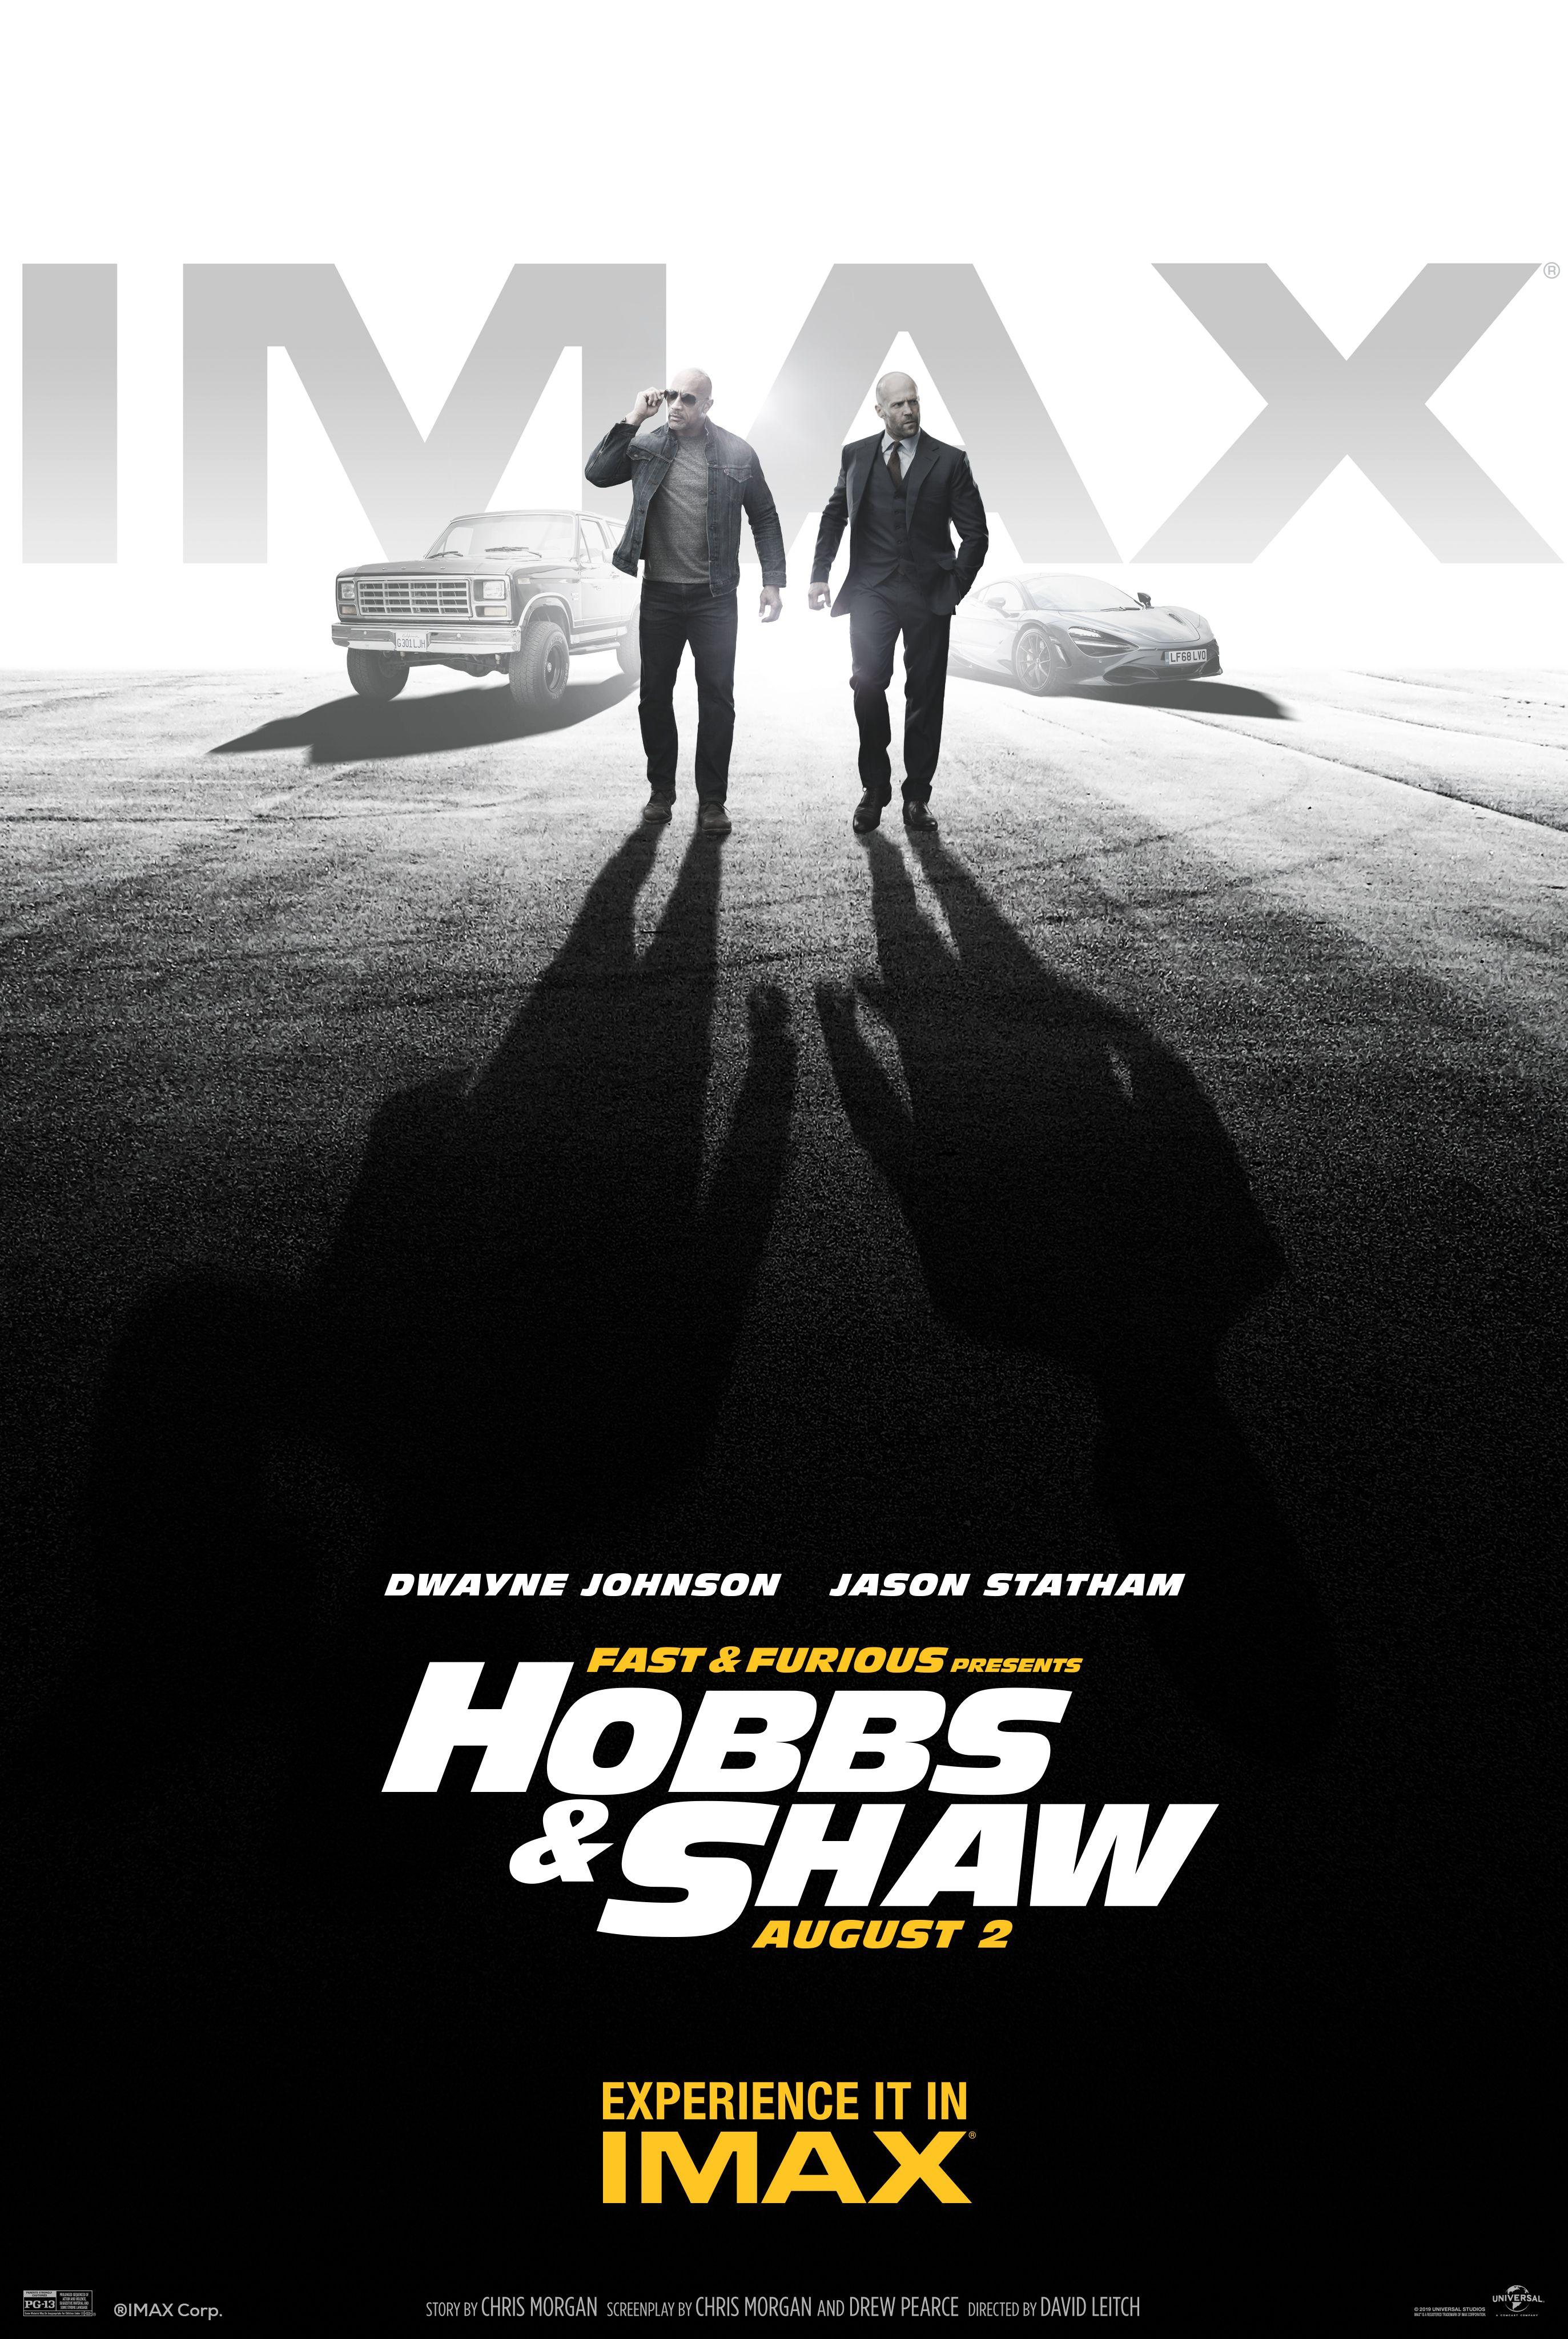 Hobbs Shaw Win Tickets To Early Imax Screening And Qa